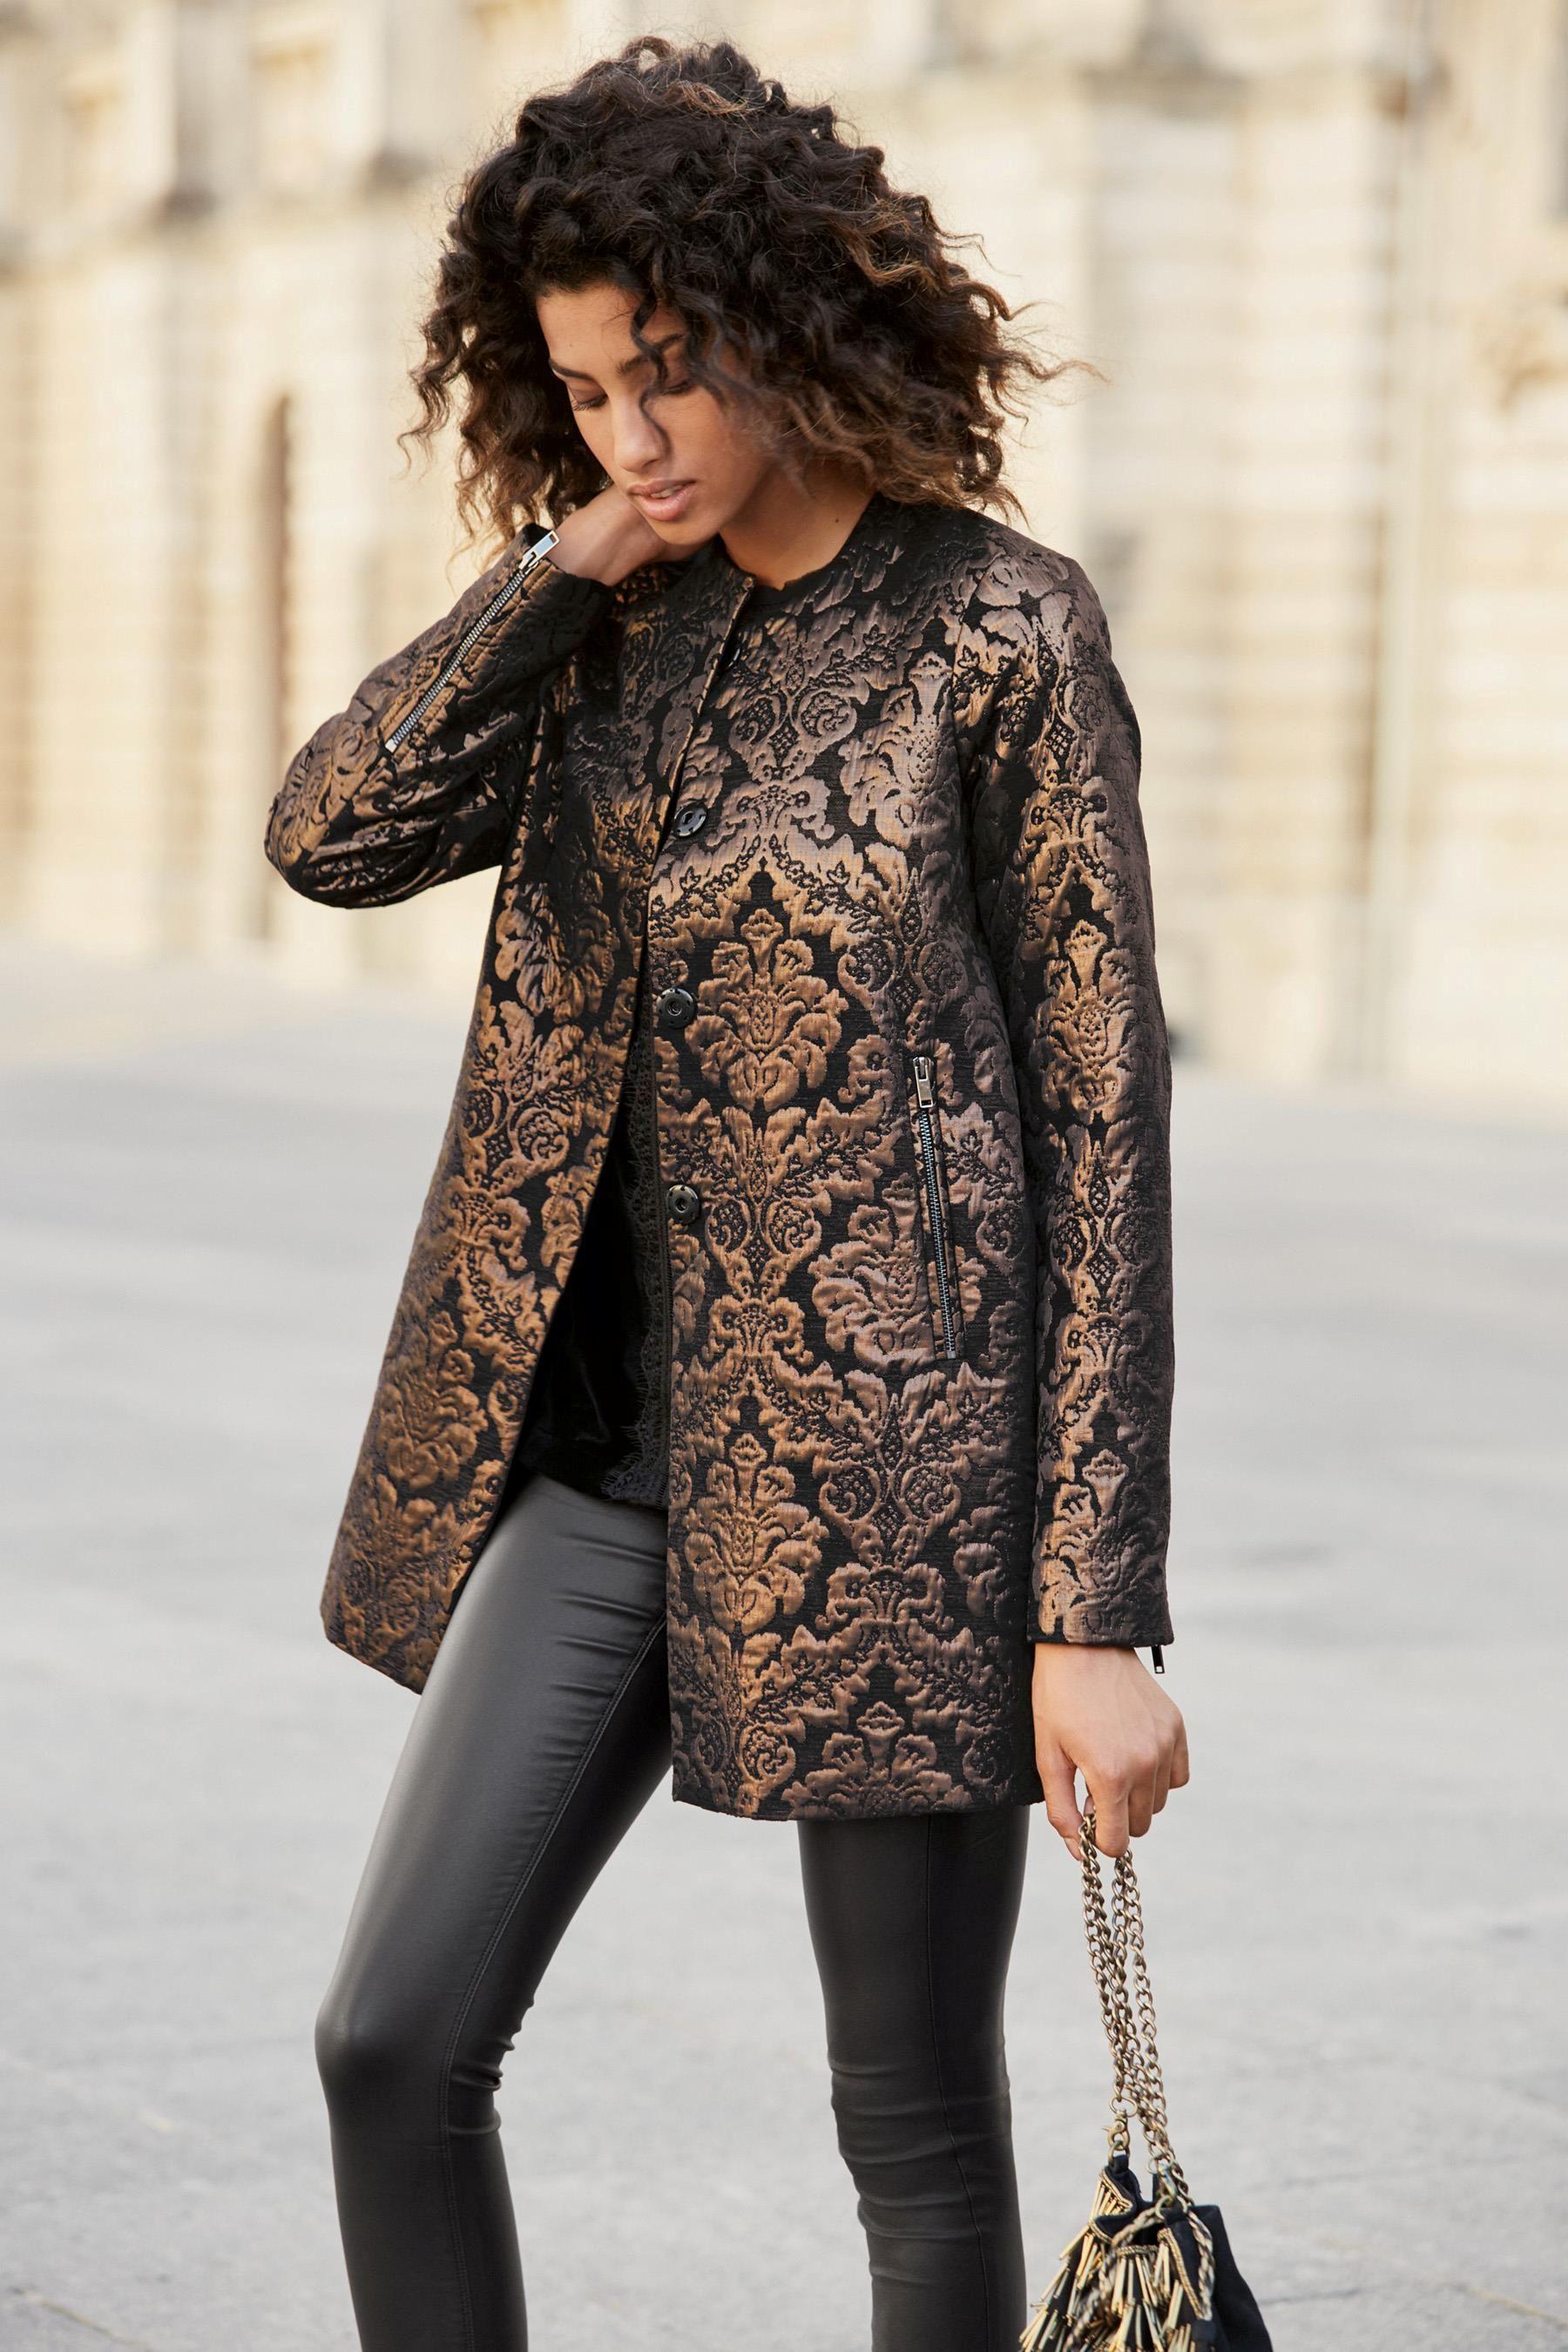 b51d604b557 Buy Black Jacquard Coat from the Next UK online shop